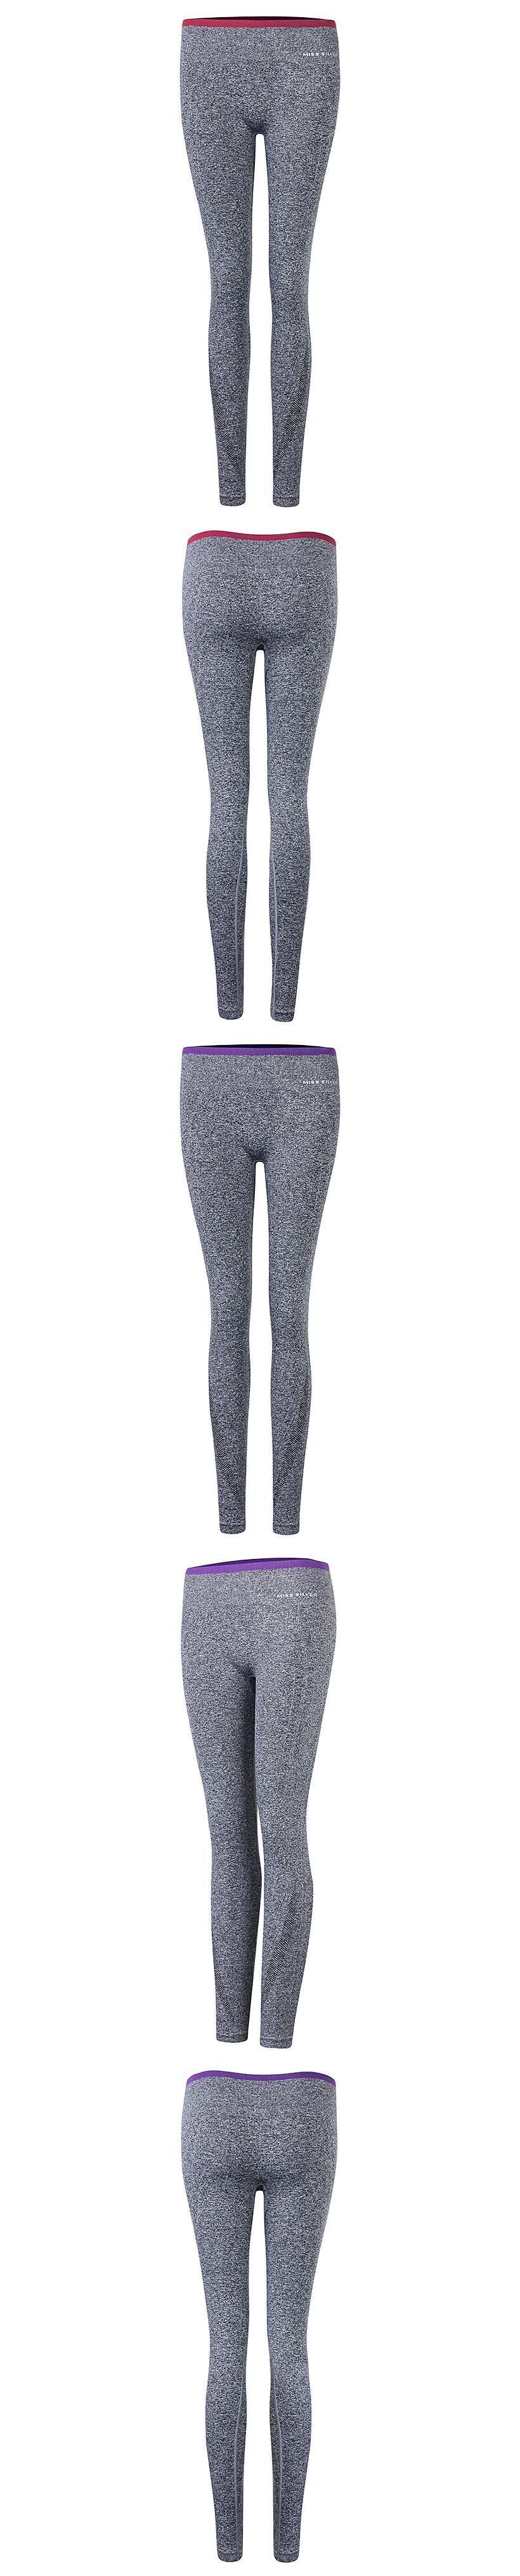 Women Yoga Leggings Sports Elastic Slimming Tights Gym Running Pants Fitness Trousers